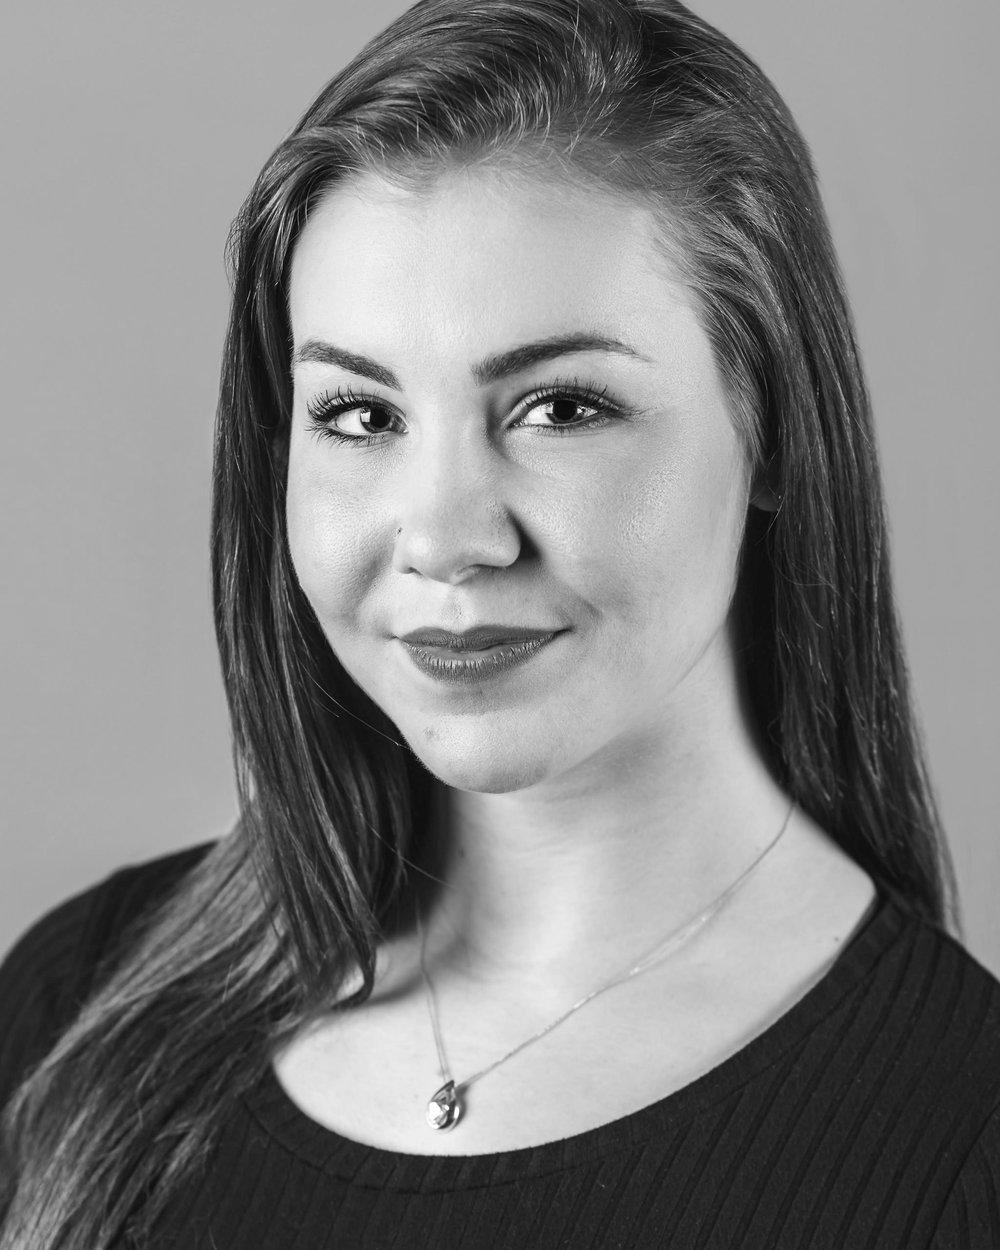 Allison Liedman